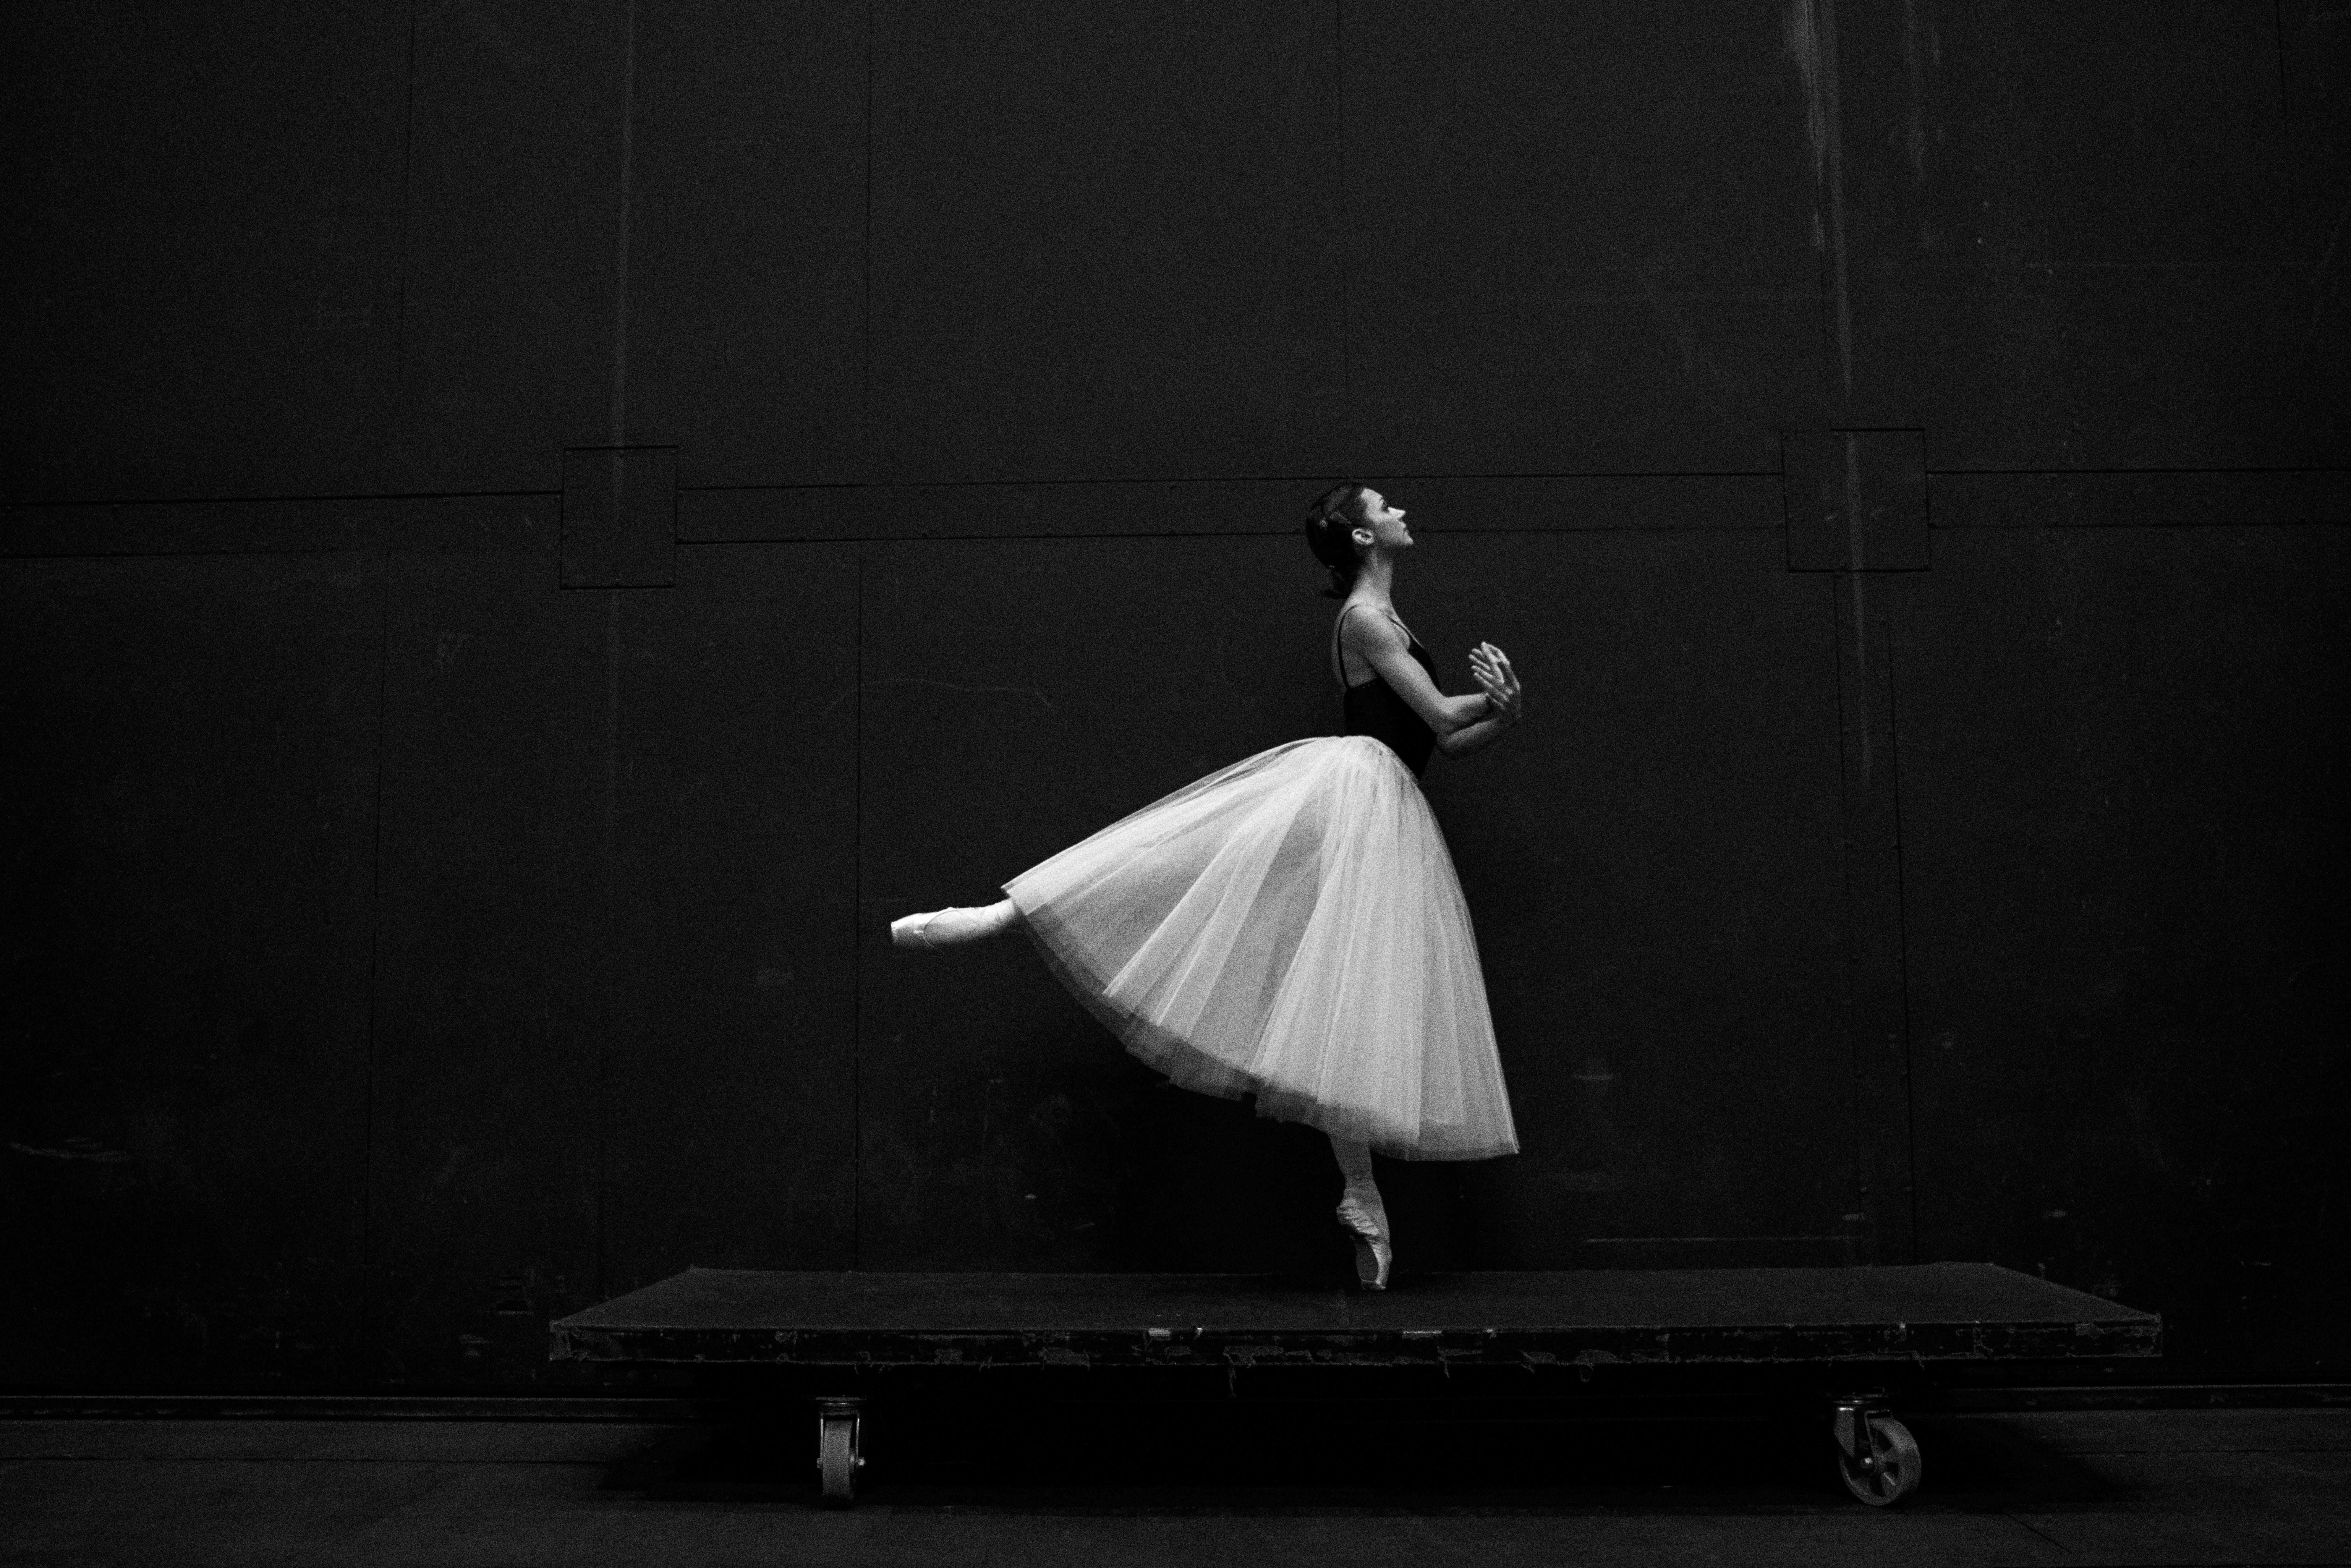 sergei gavrilov gbd6PqRqGms unsplash - Påklædning til ballet